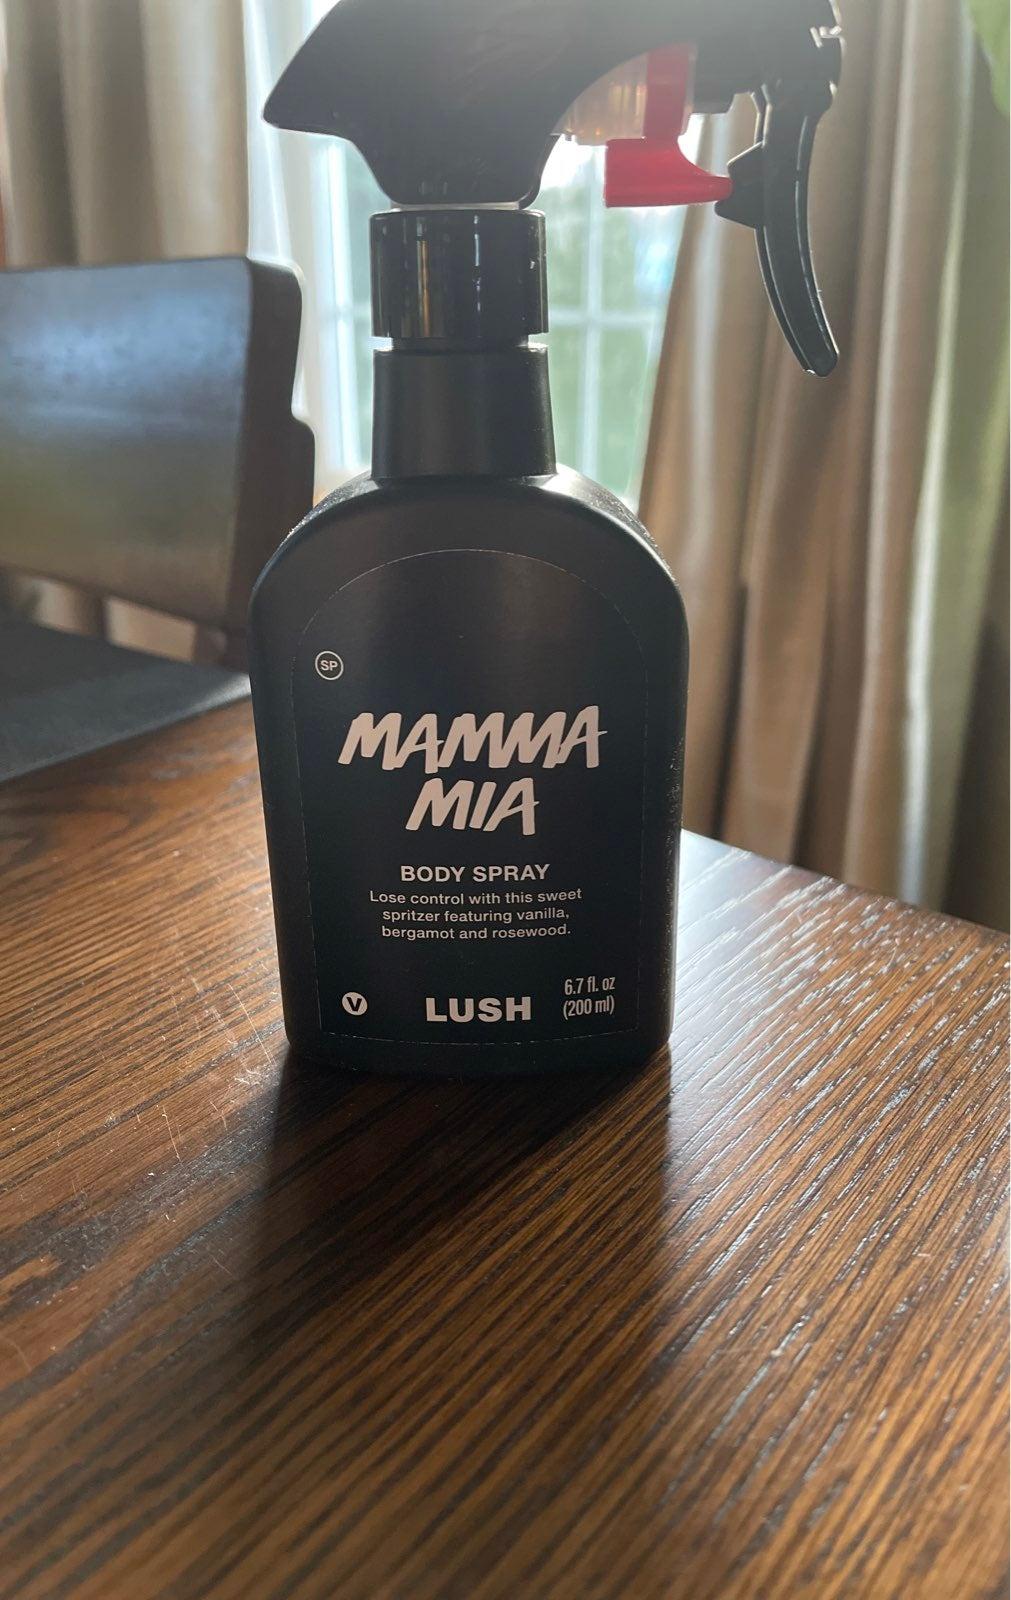 Lush Mamma Mia Body Spray